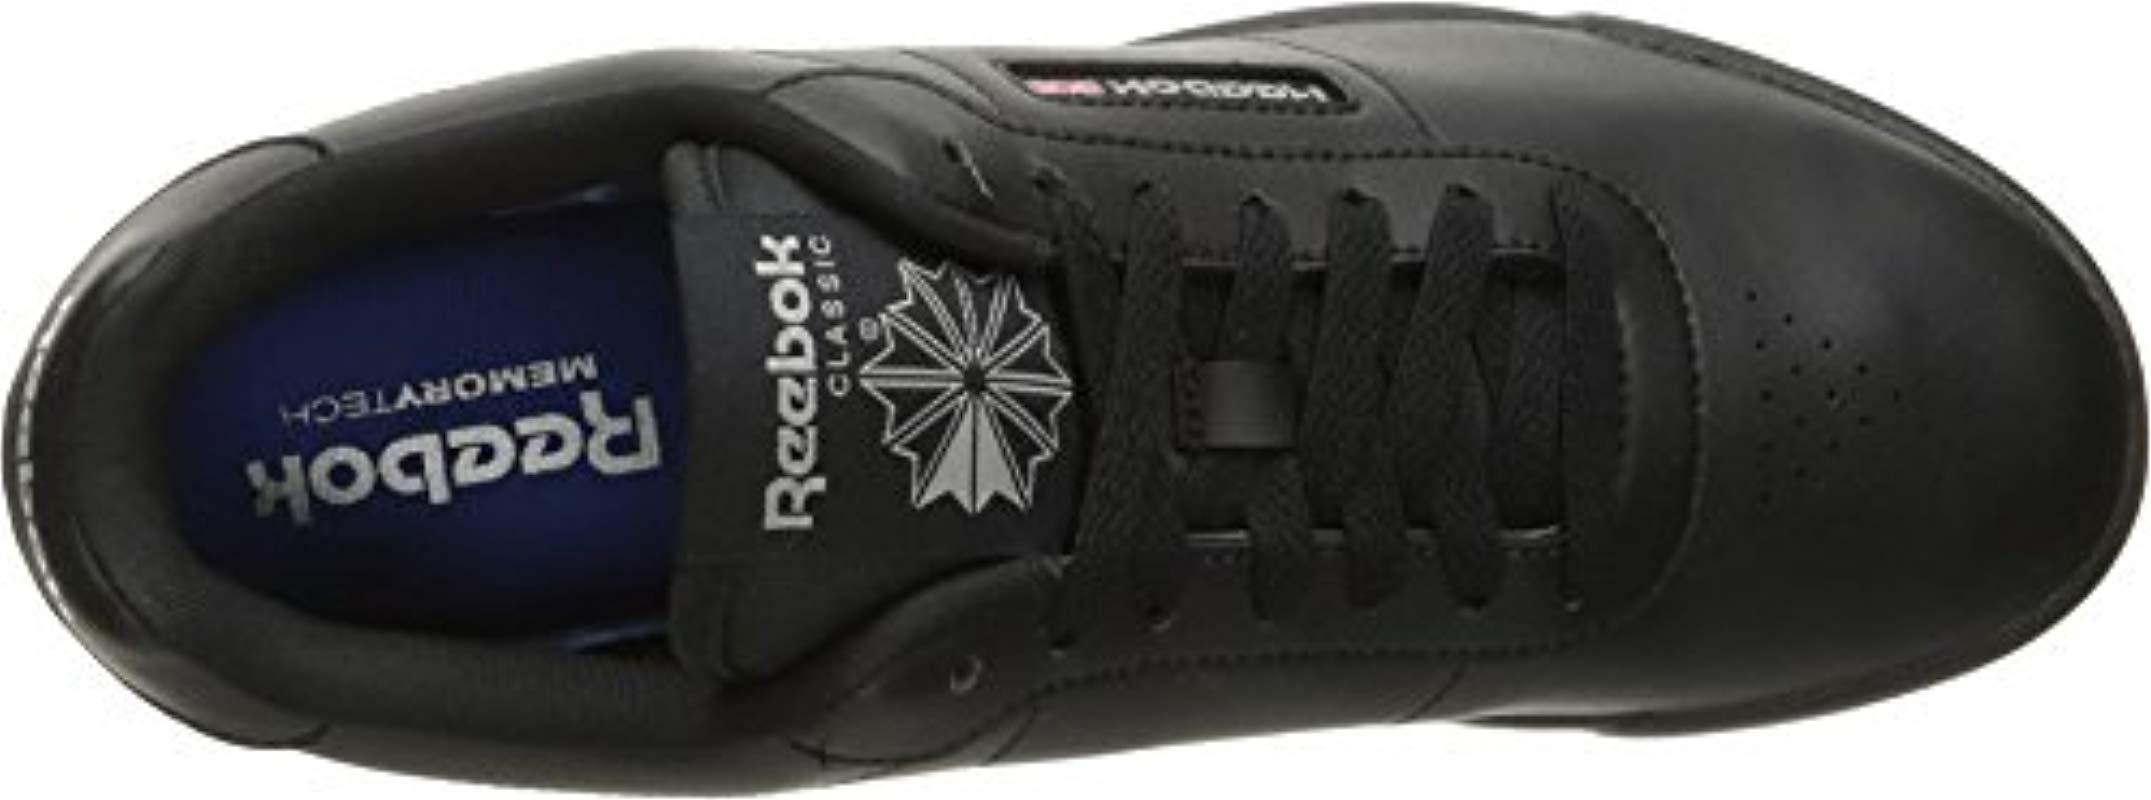 ac805e22d54 Reebok - Black Princess Lite Classic Shoe - Lyst. View fullscreen